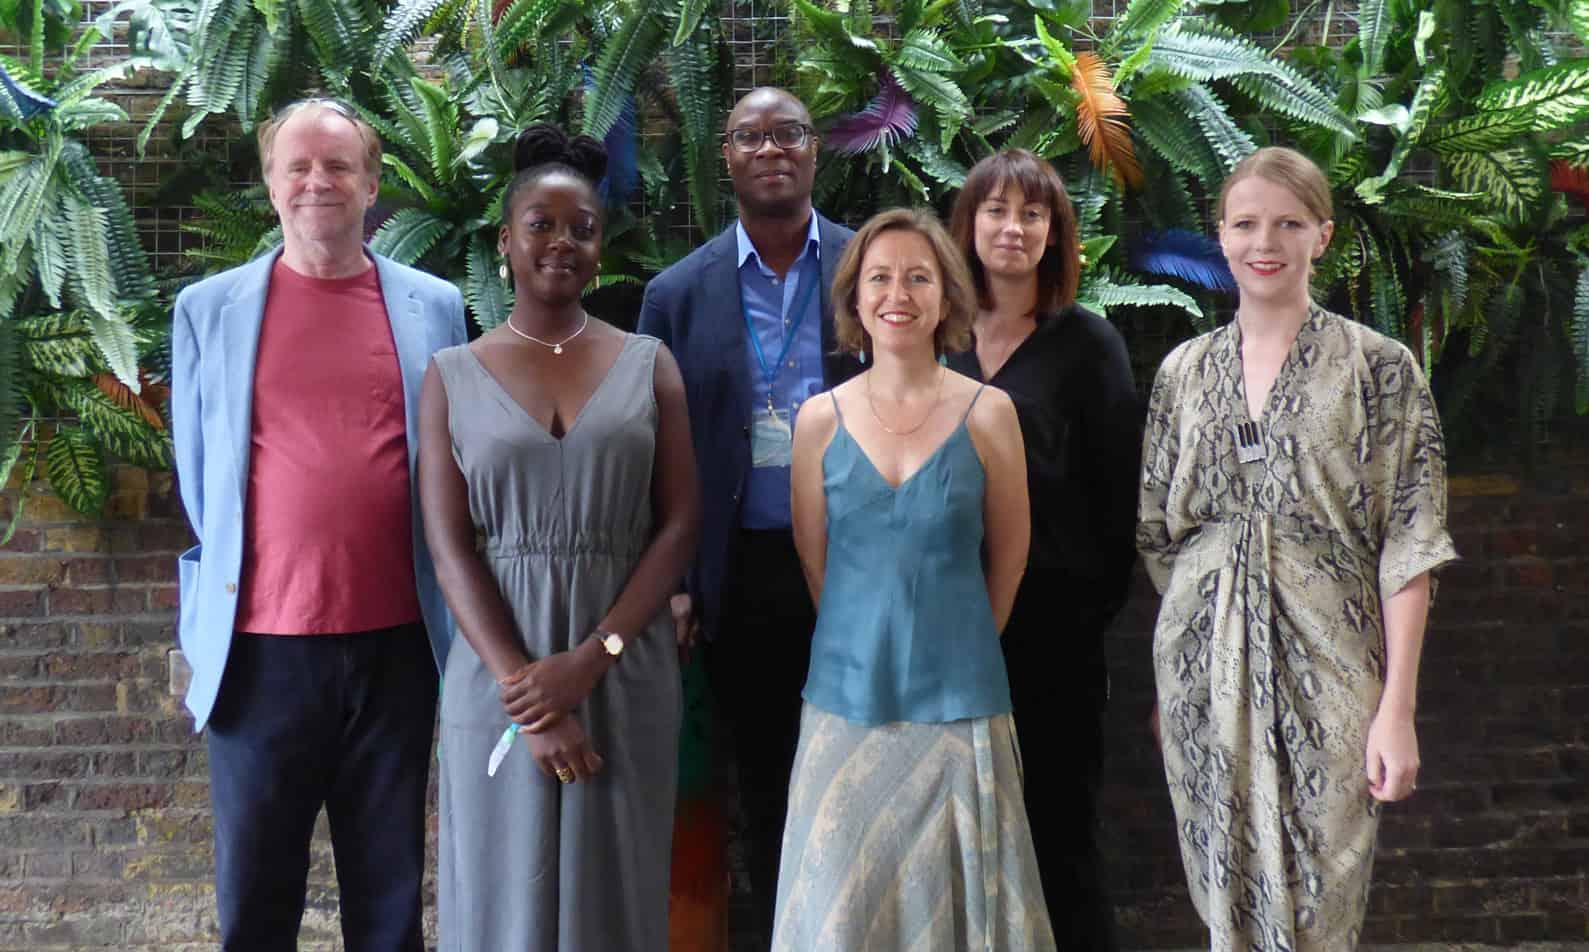 Our panellists and moderator, L-R: Robin Millar, Cassie Kinoshi, Wesley John, Vanessa Reid, Fran Matthews & Olga Fitzroy